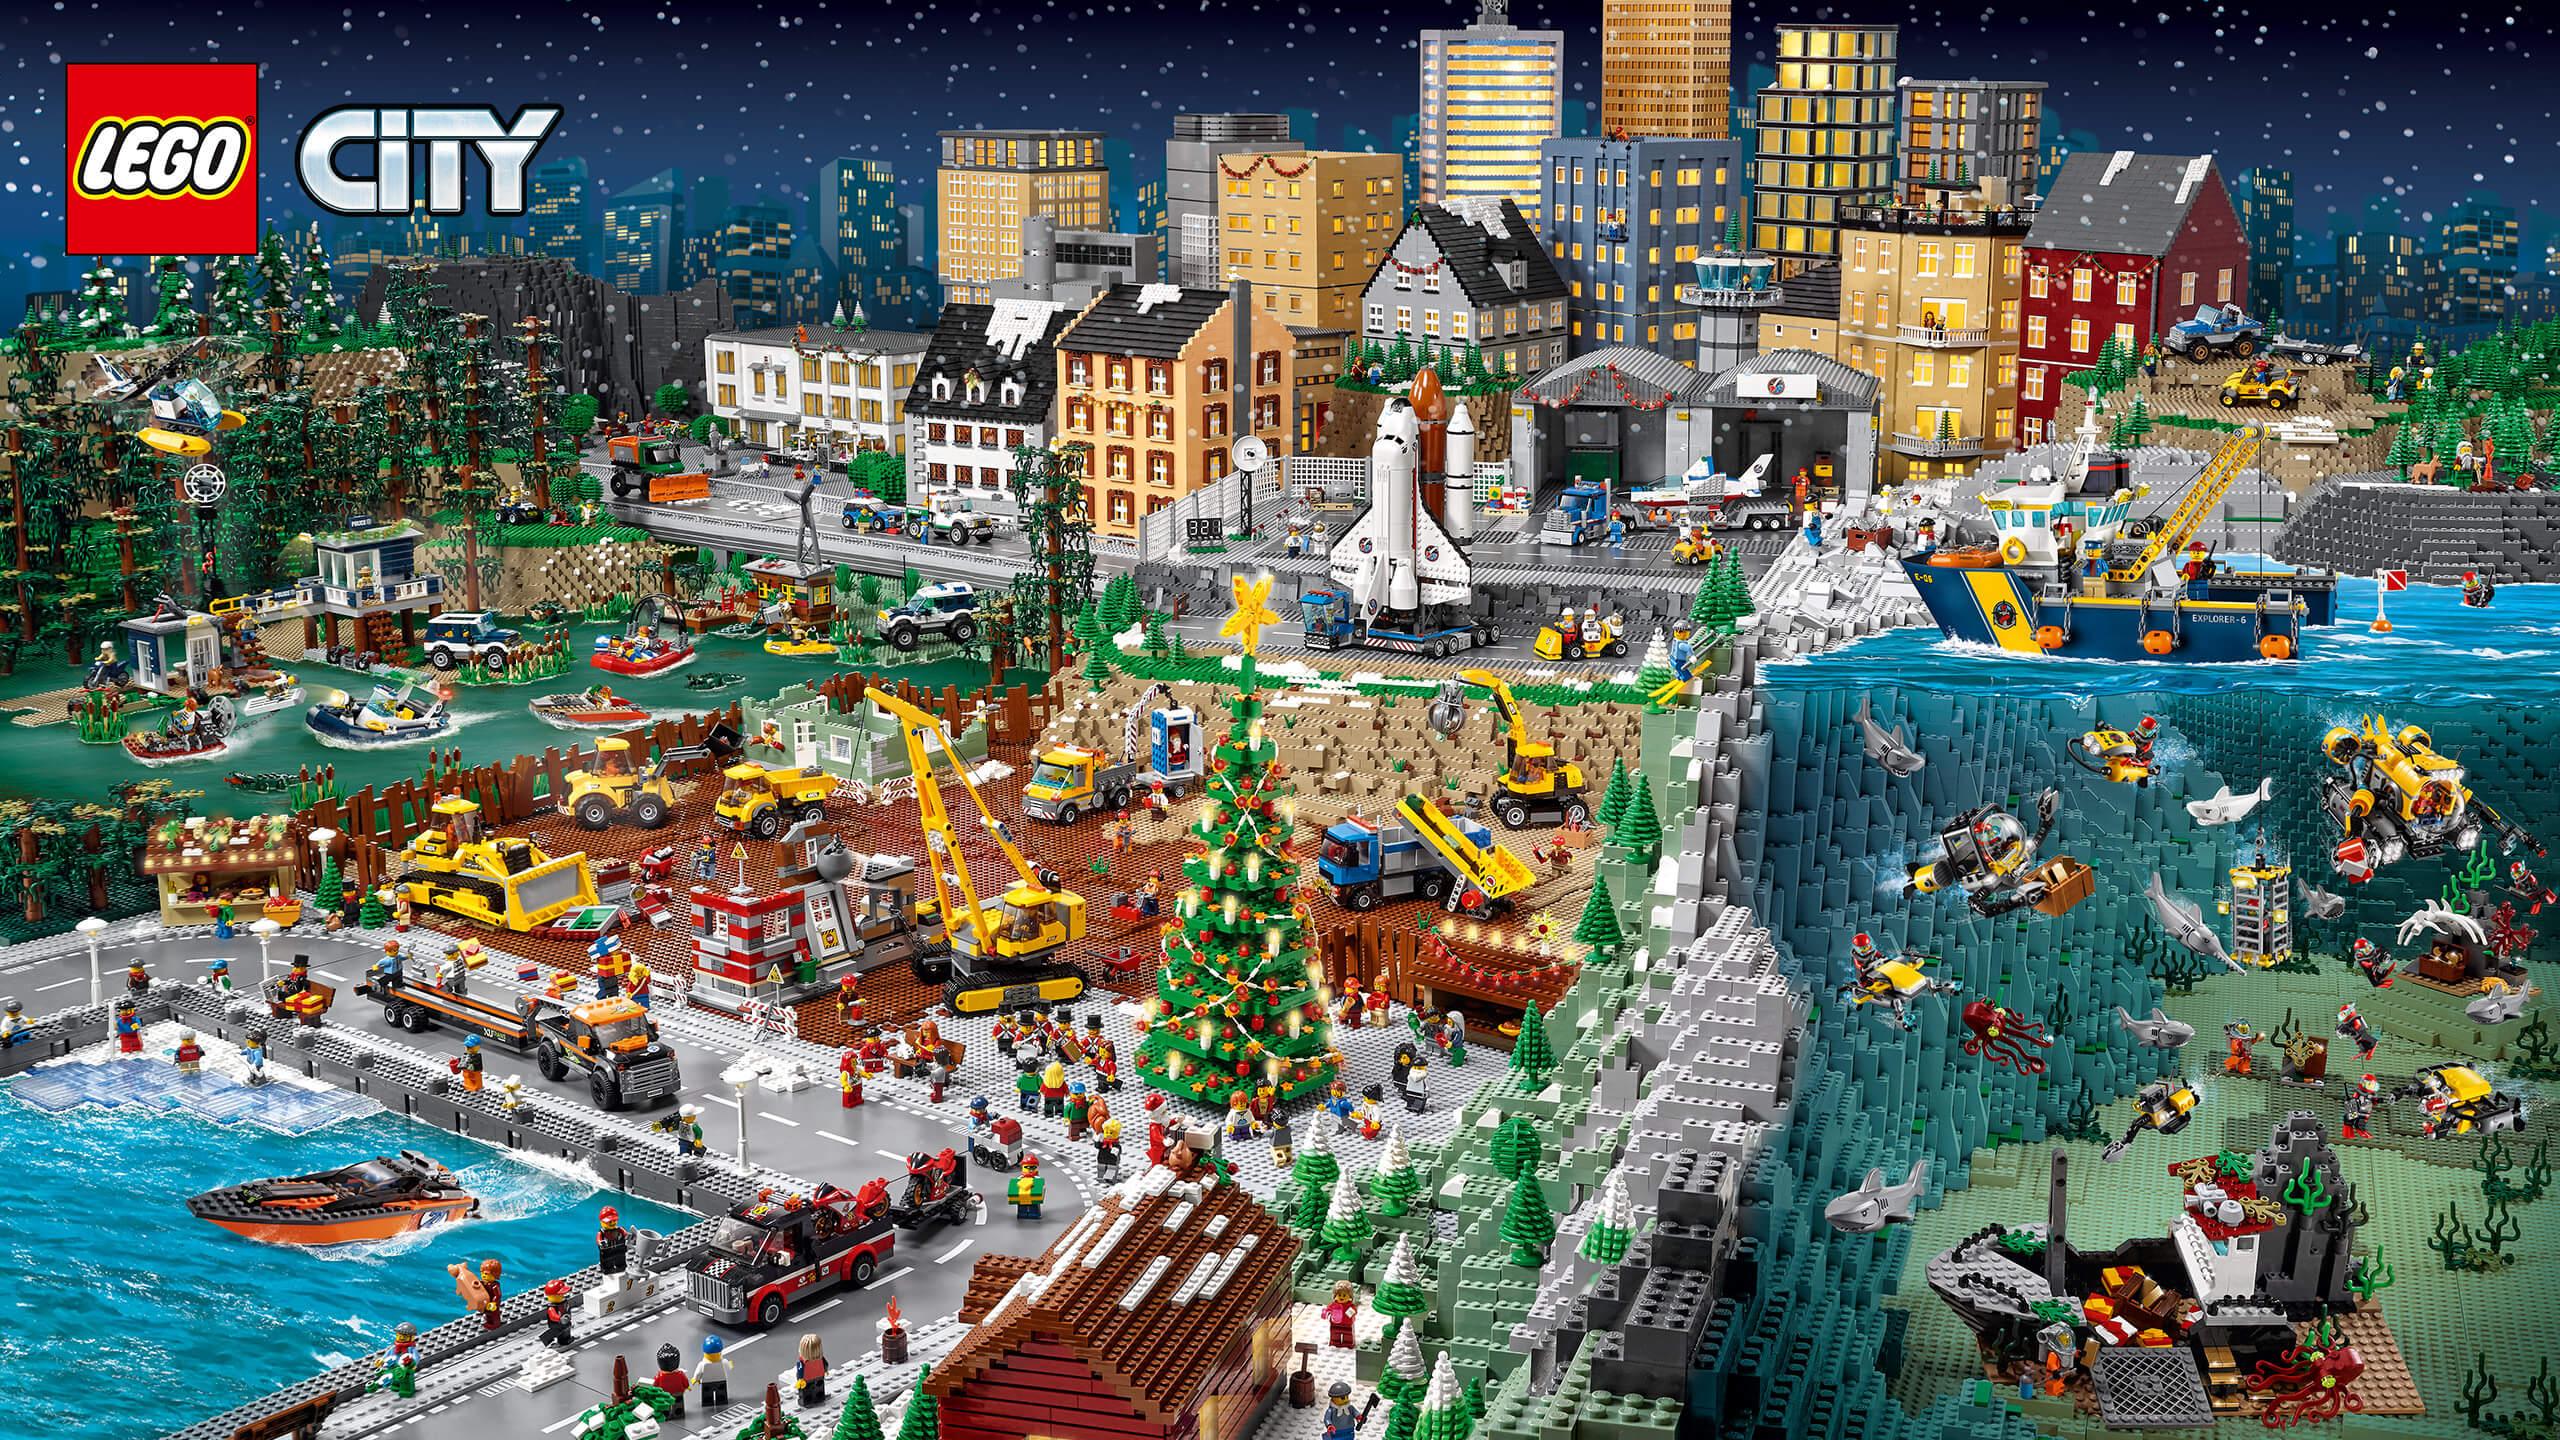 download wallpaper: LEGO City – kerst wallpaper